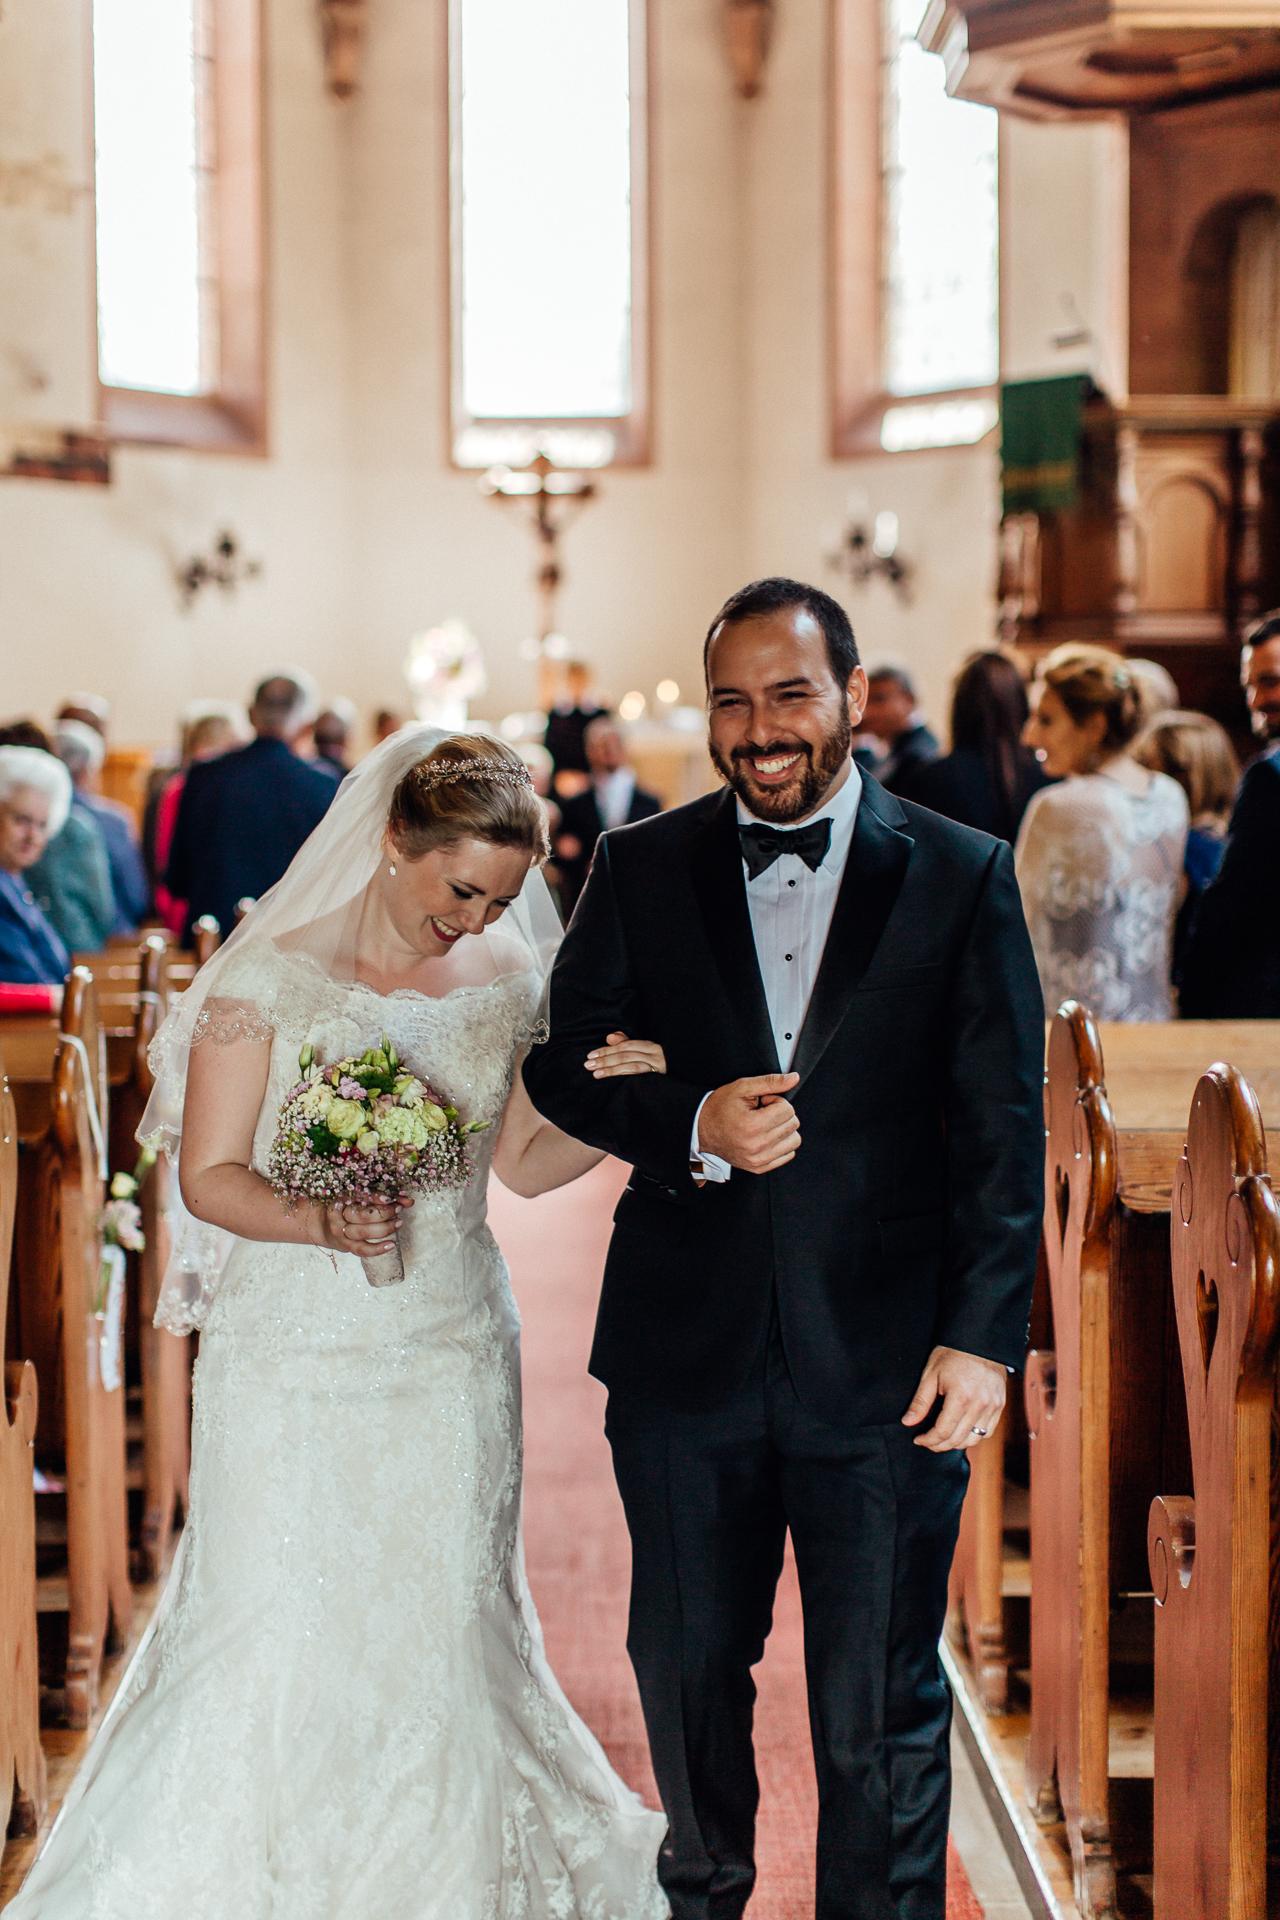 Christina & Andrew 16-06-2016 - Sandra Socha Fotografie-45